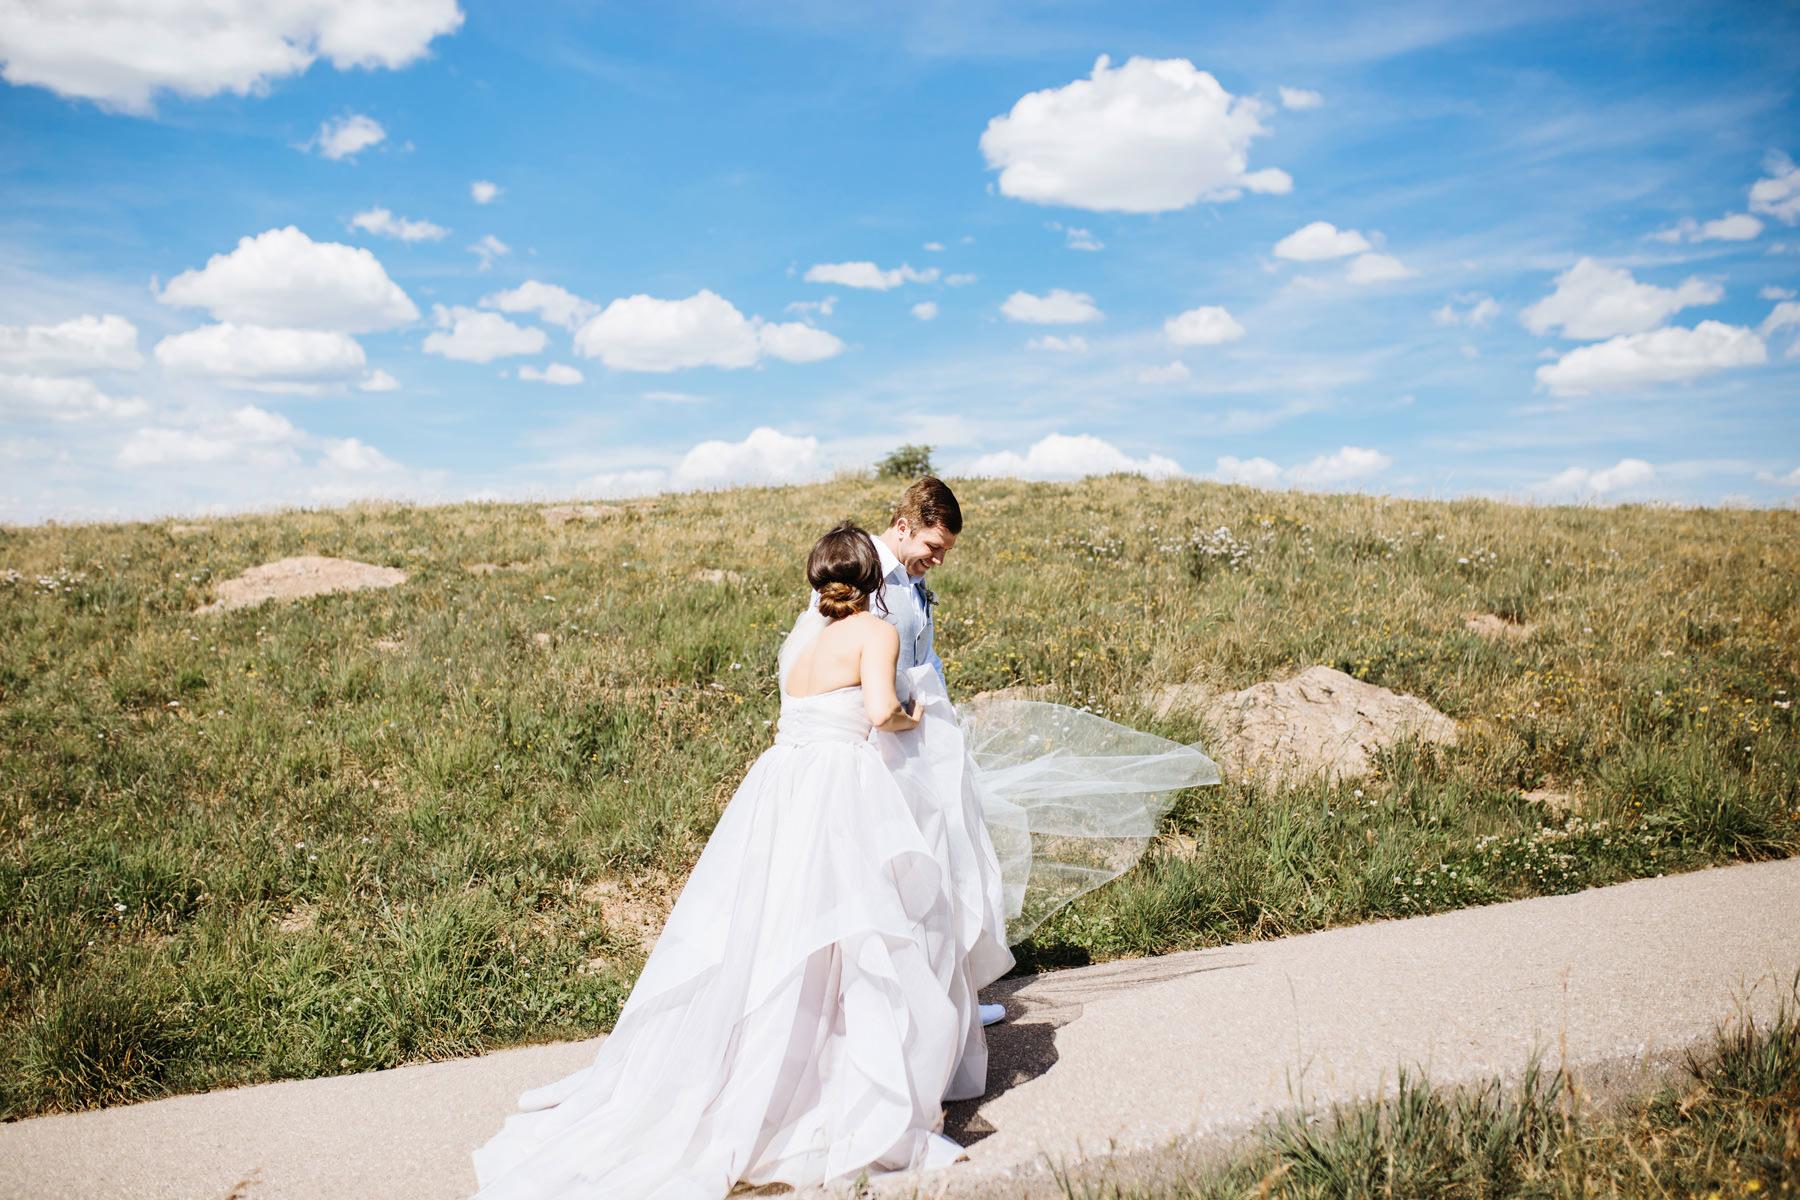 Vail Colorado Wedding Deck_ Kindling Wedding Photography42.JPG